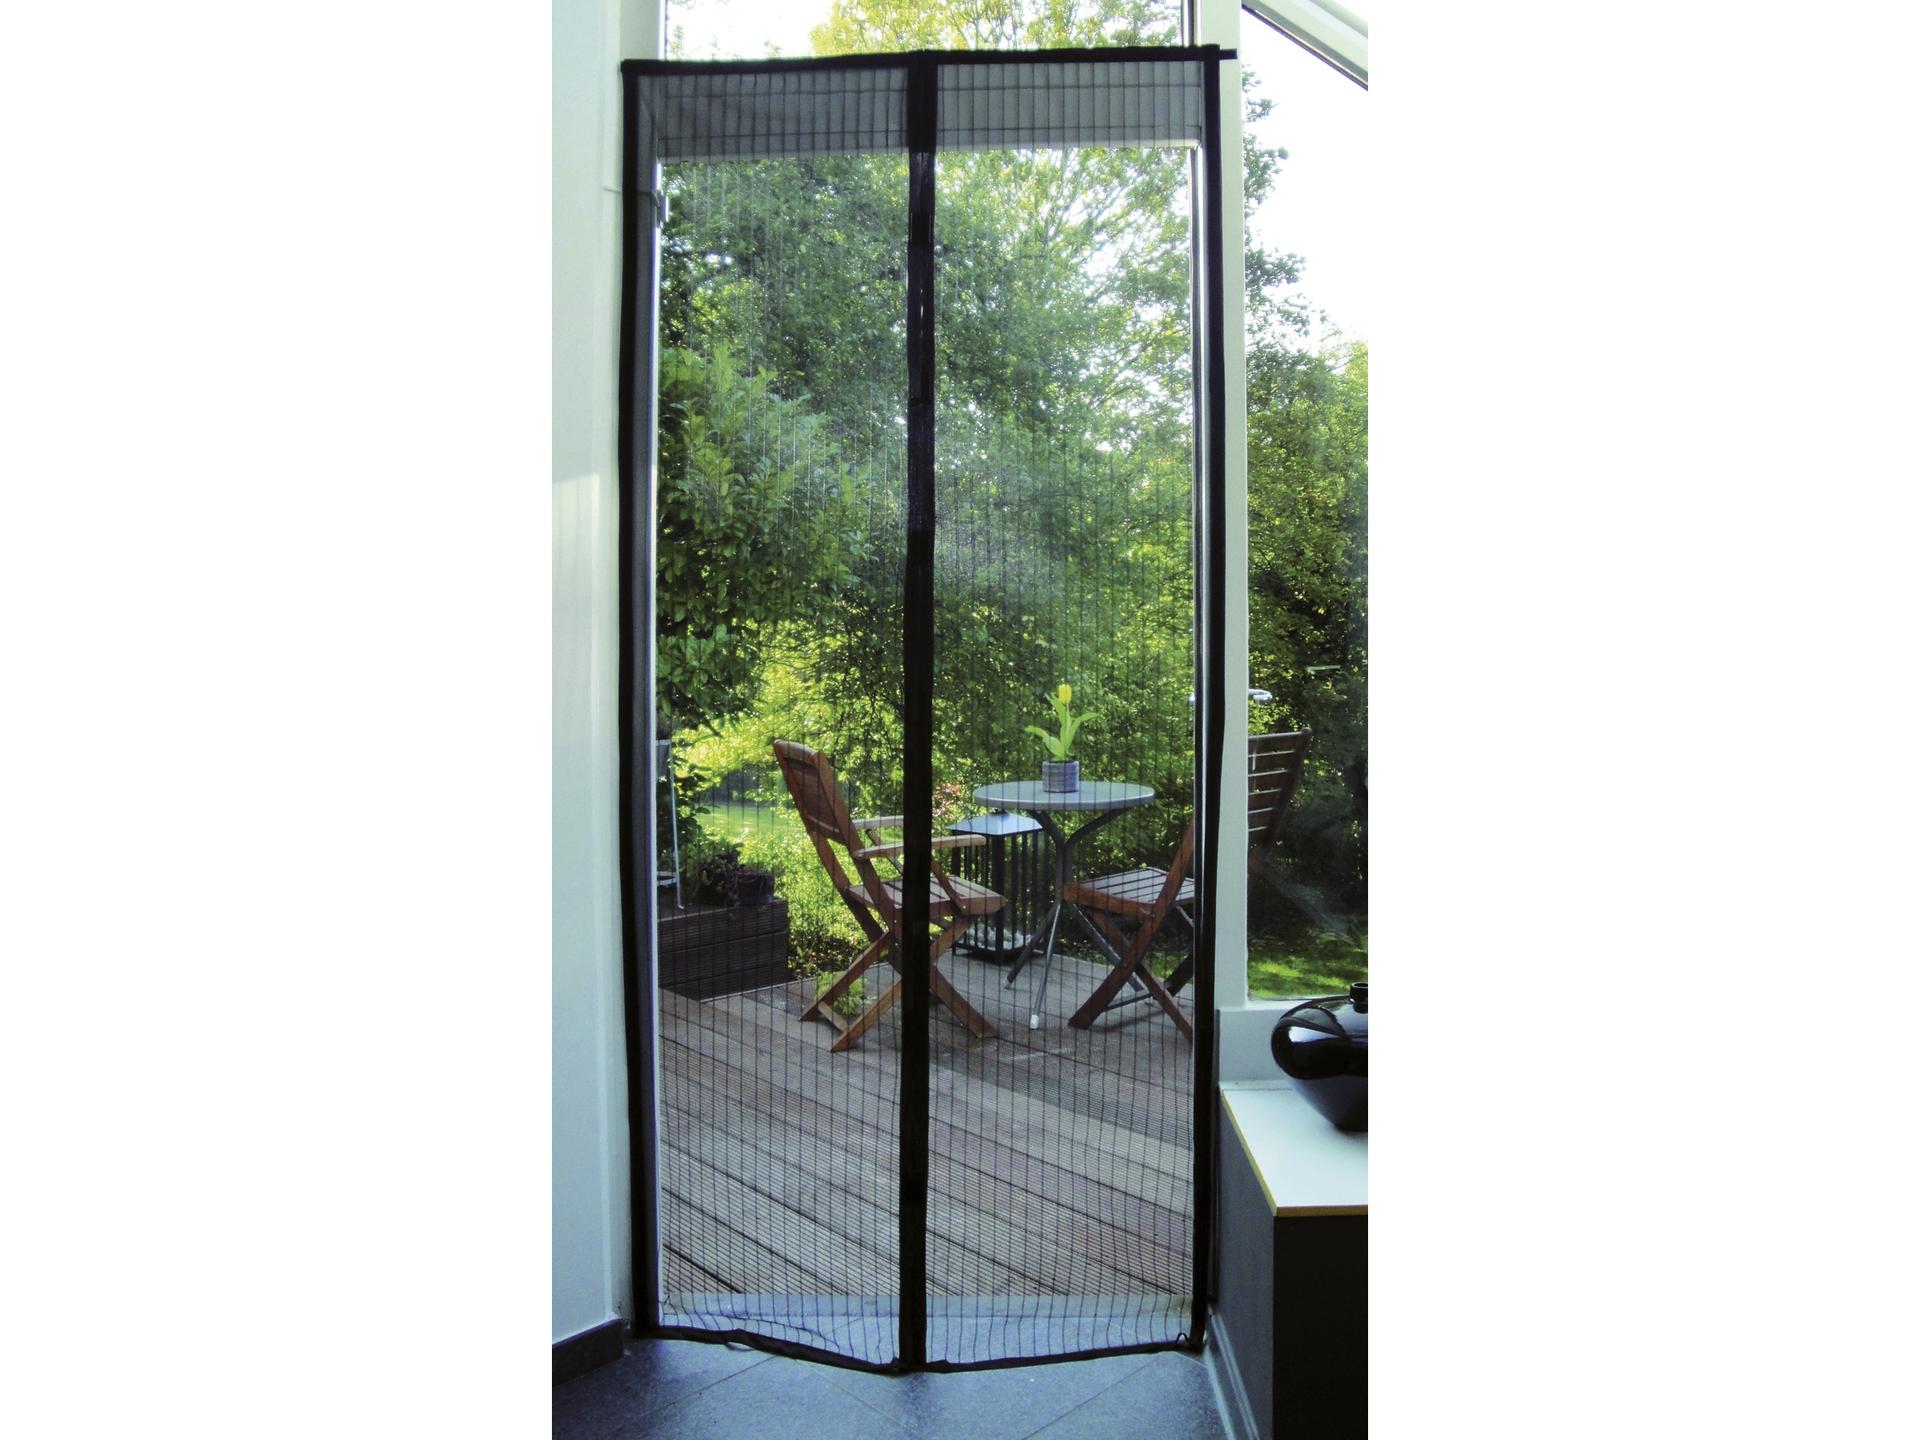 Porte moustiquaire myshopi for Porte 85 cm